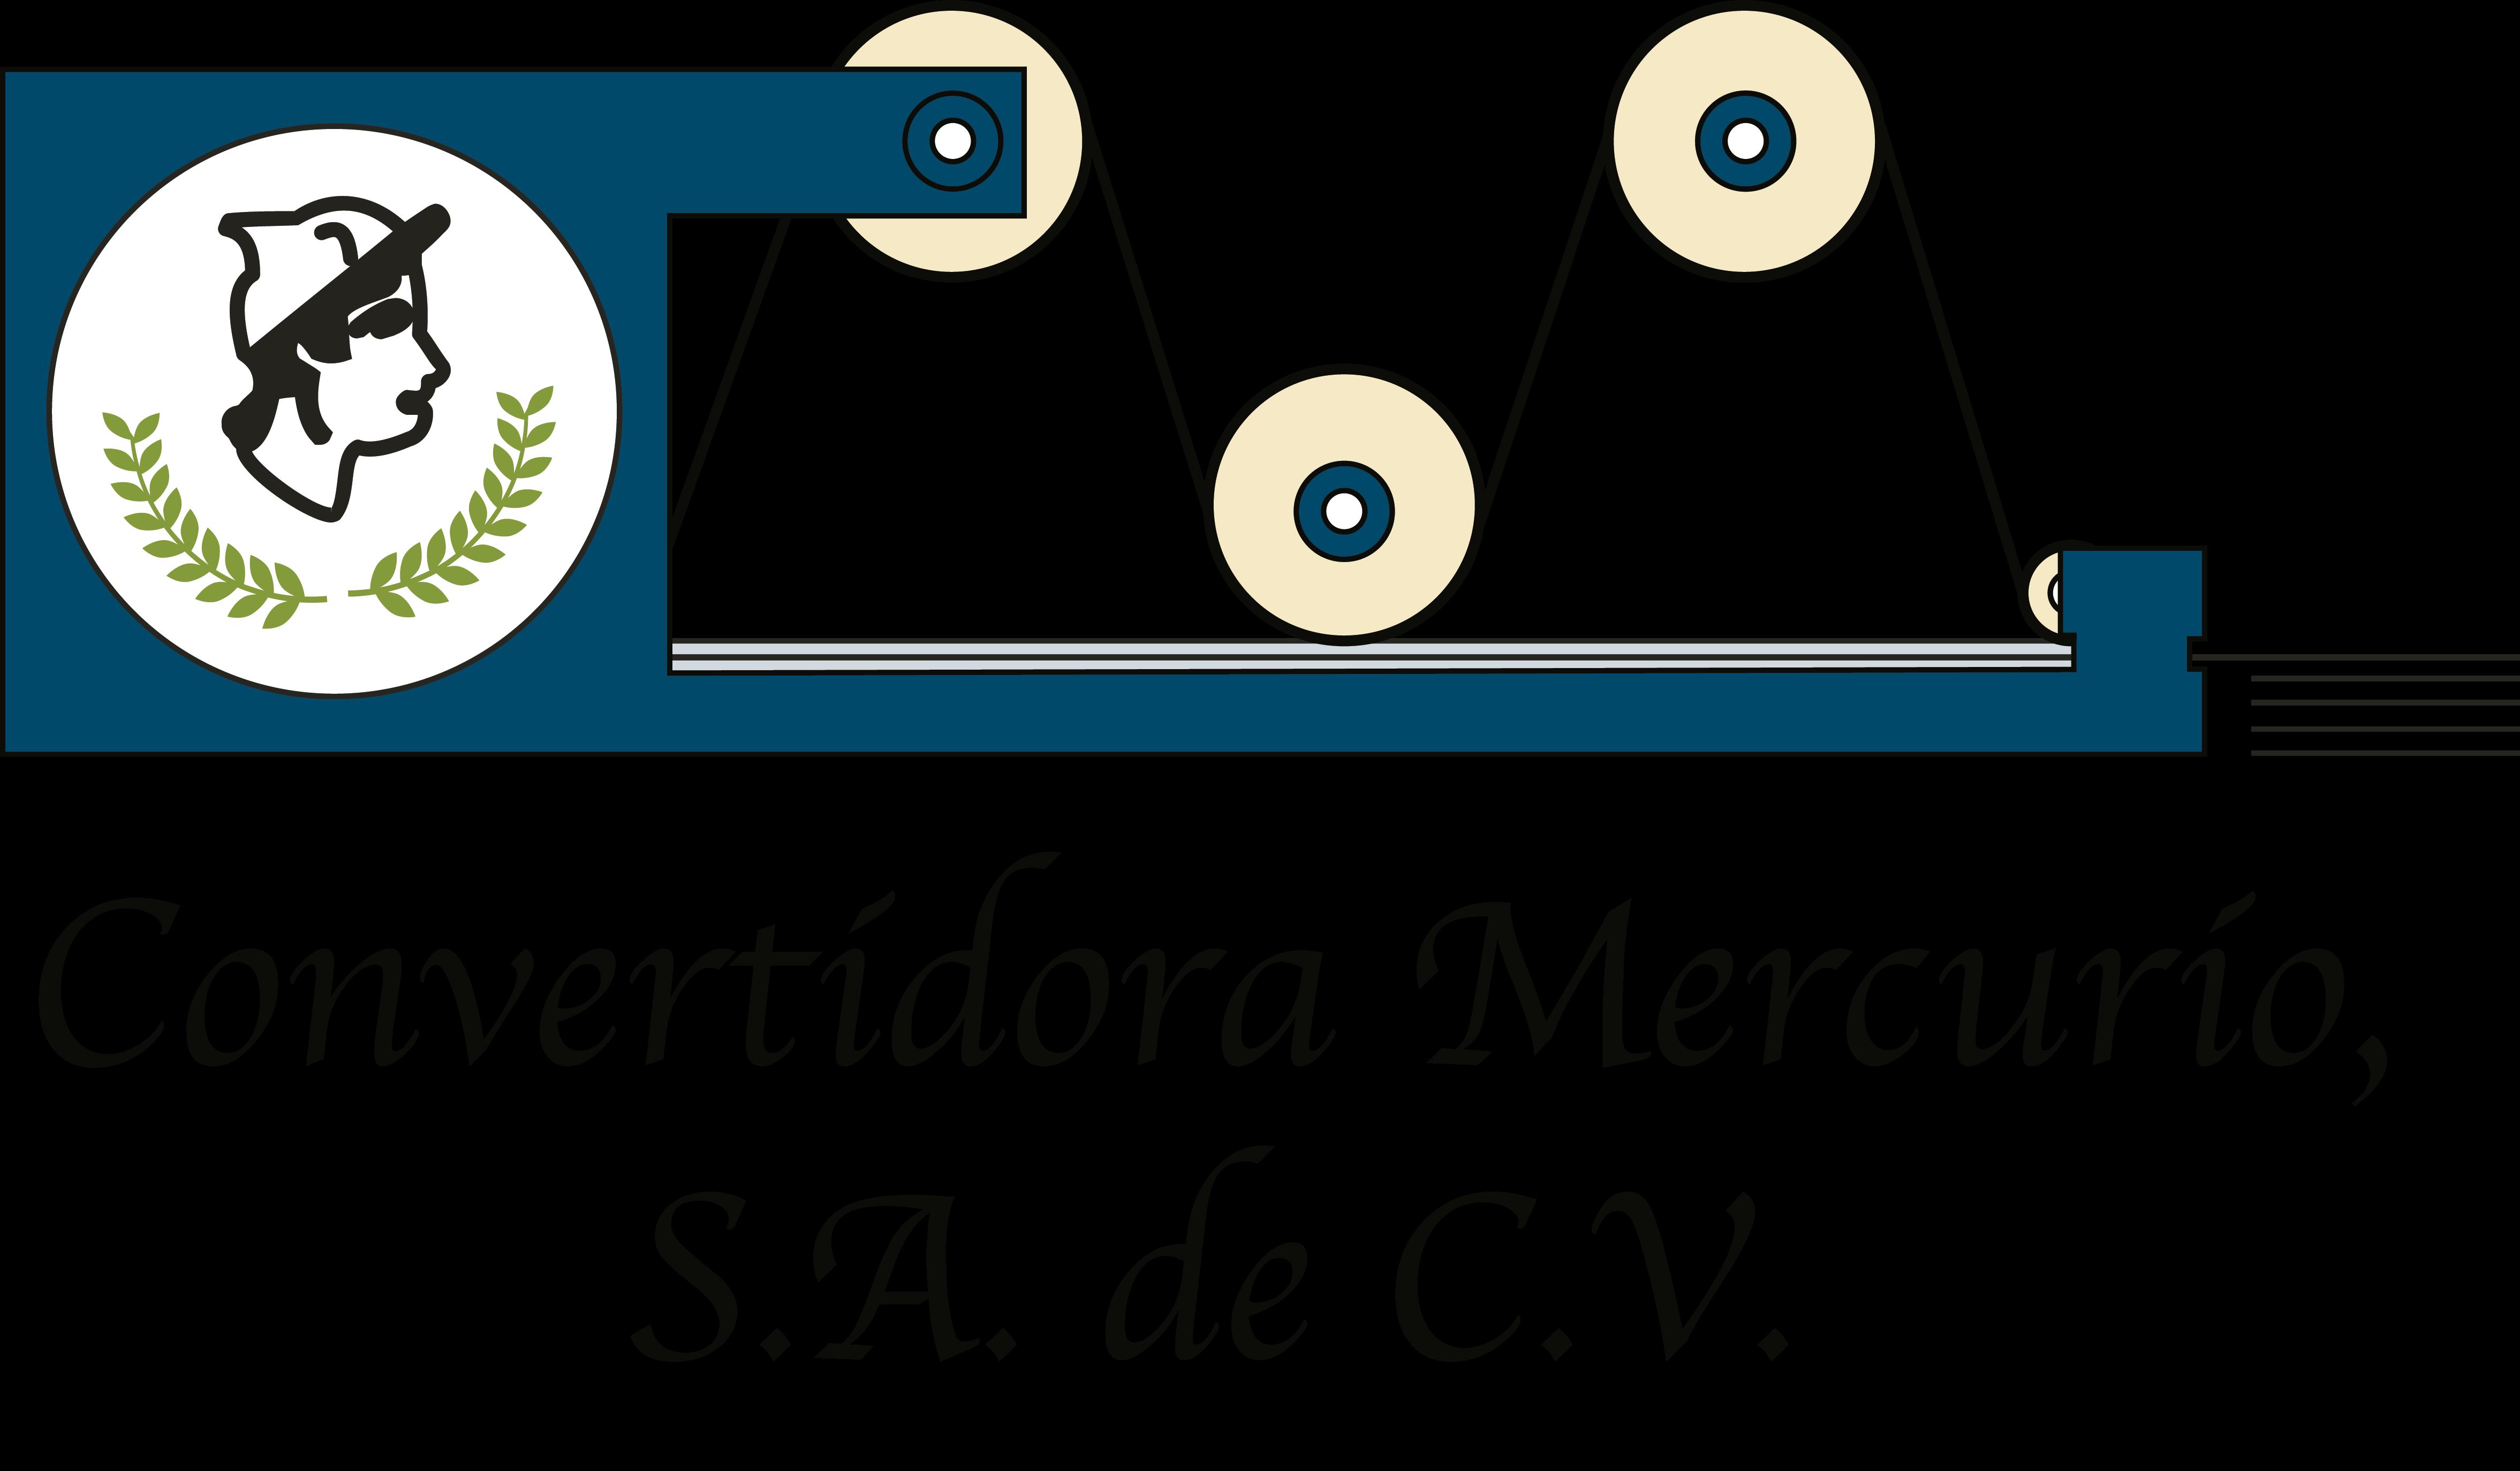 CONVERTIDORA MERCURIO